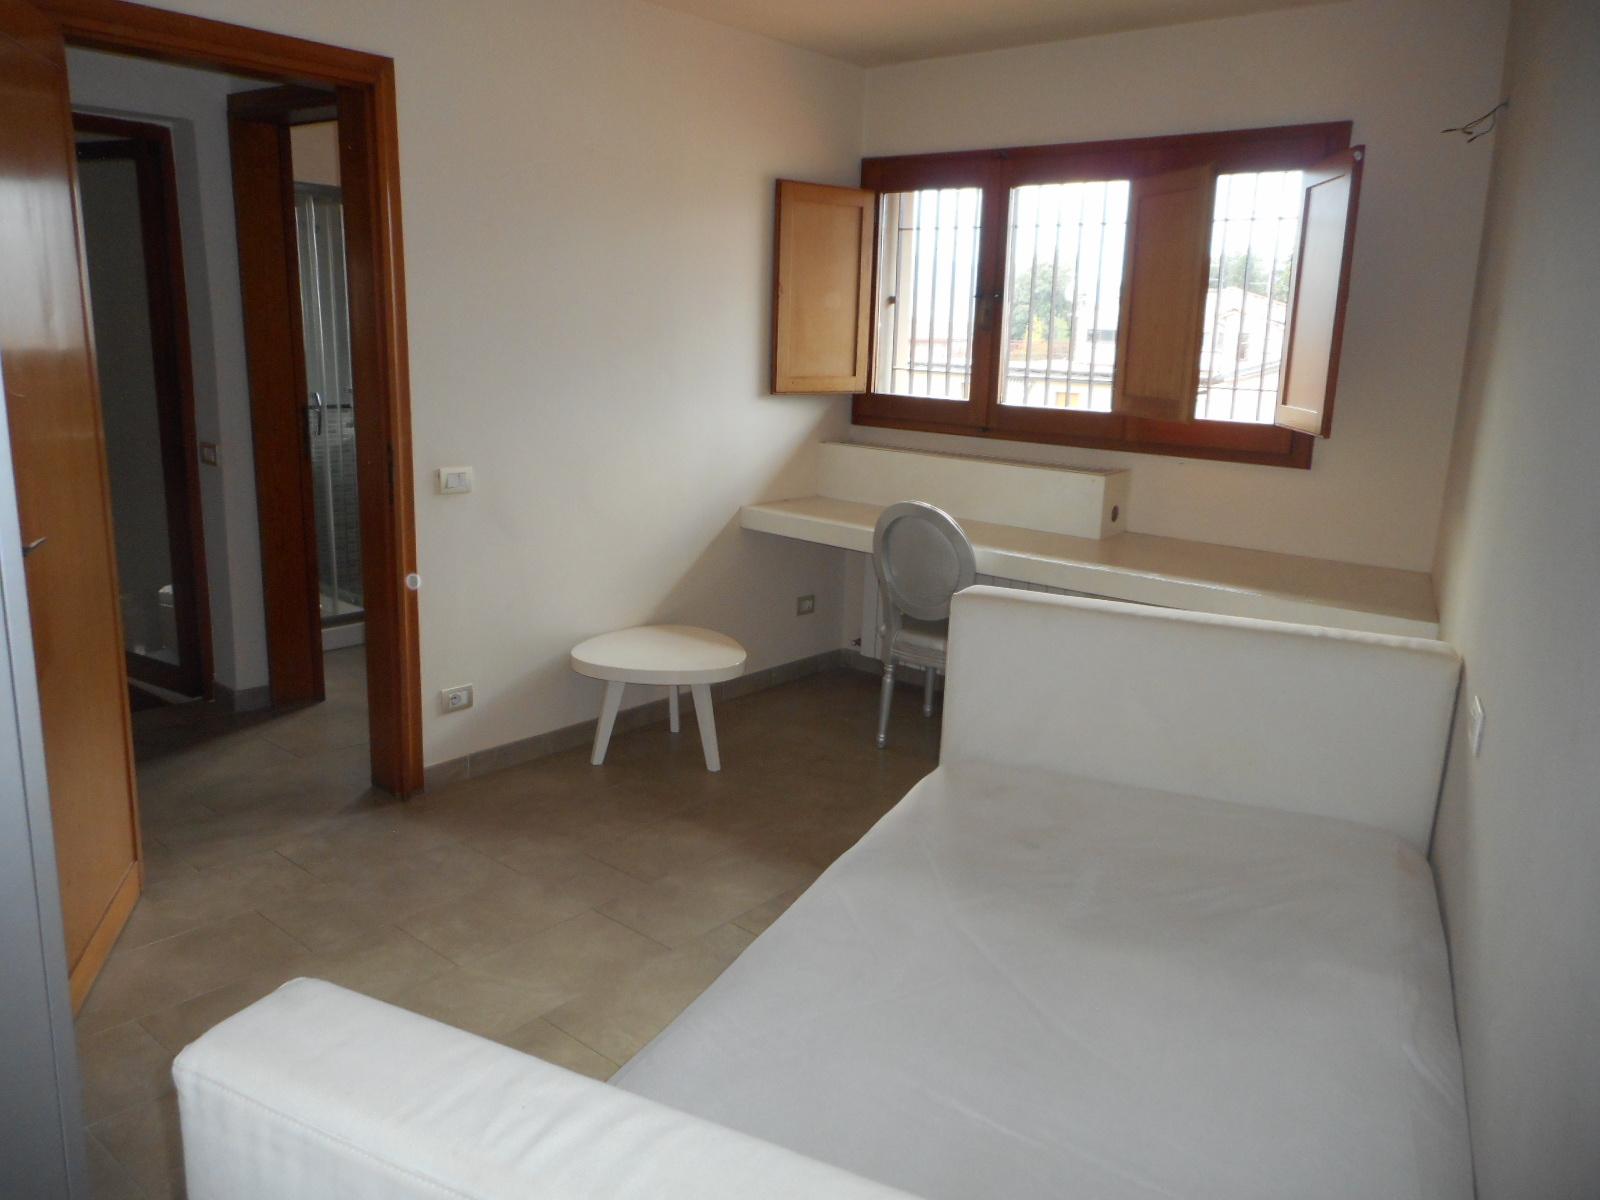 porta lucchese,pistoia,51100,2 Bedrooms Bedrooms,1 BagnoBathrooms,Appartamento,porta lucchese,1276